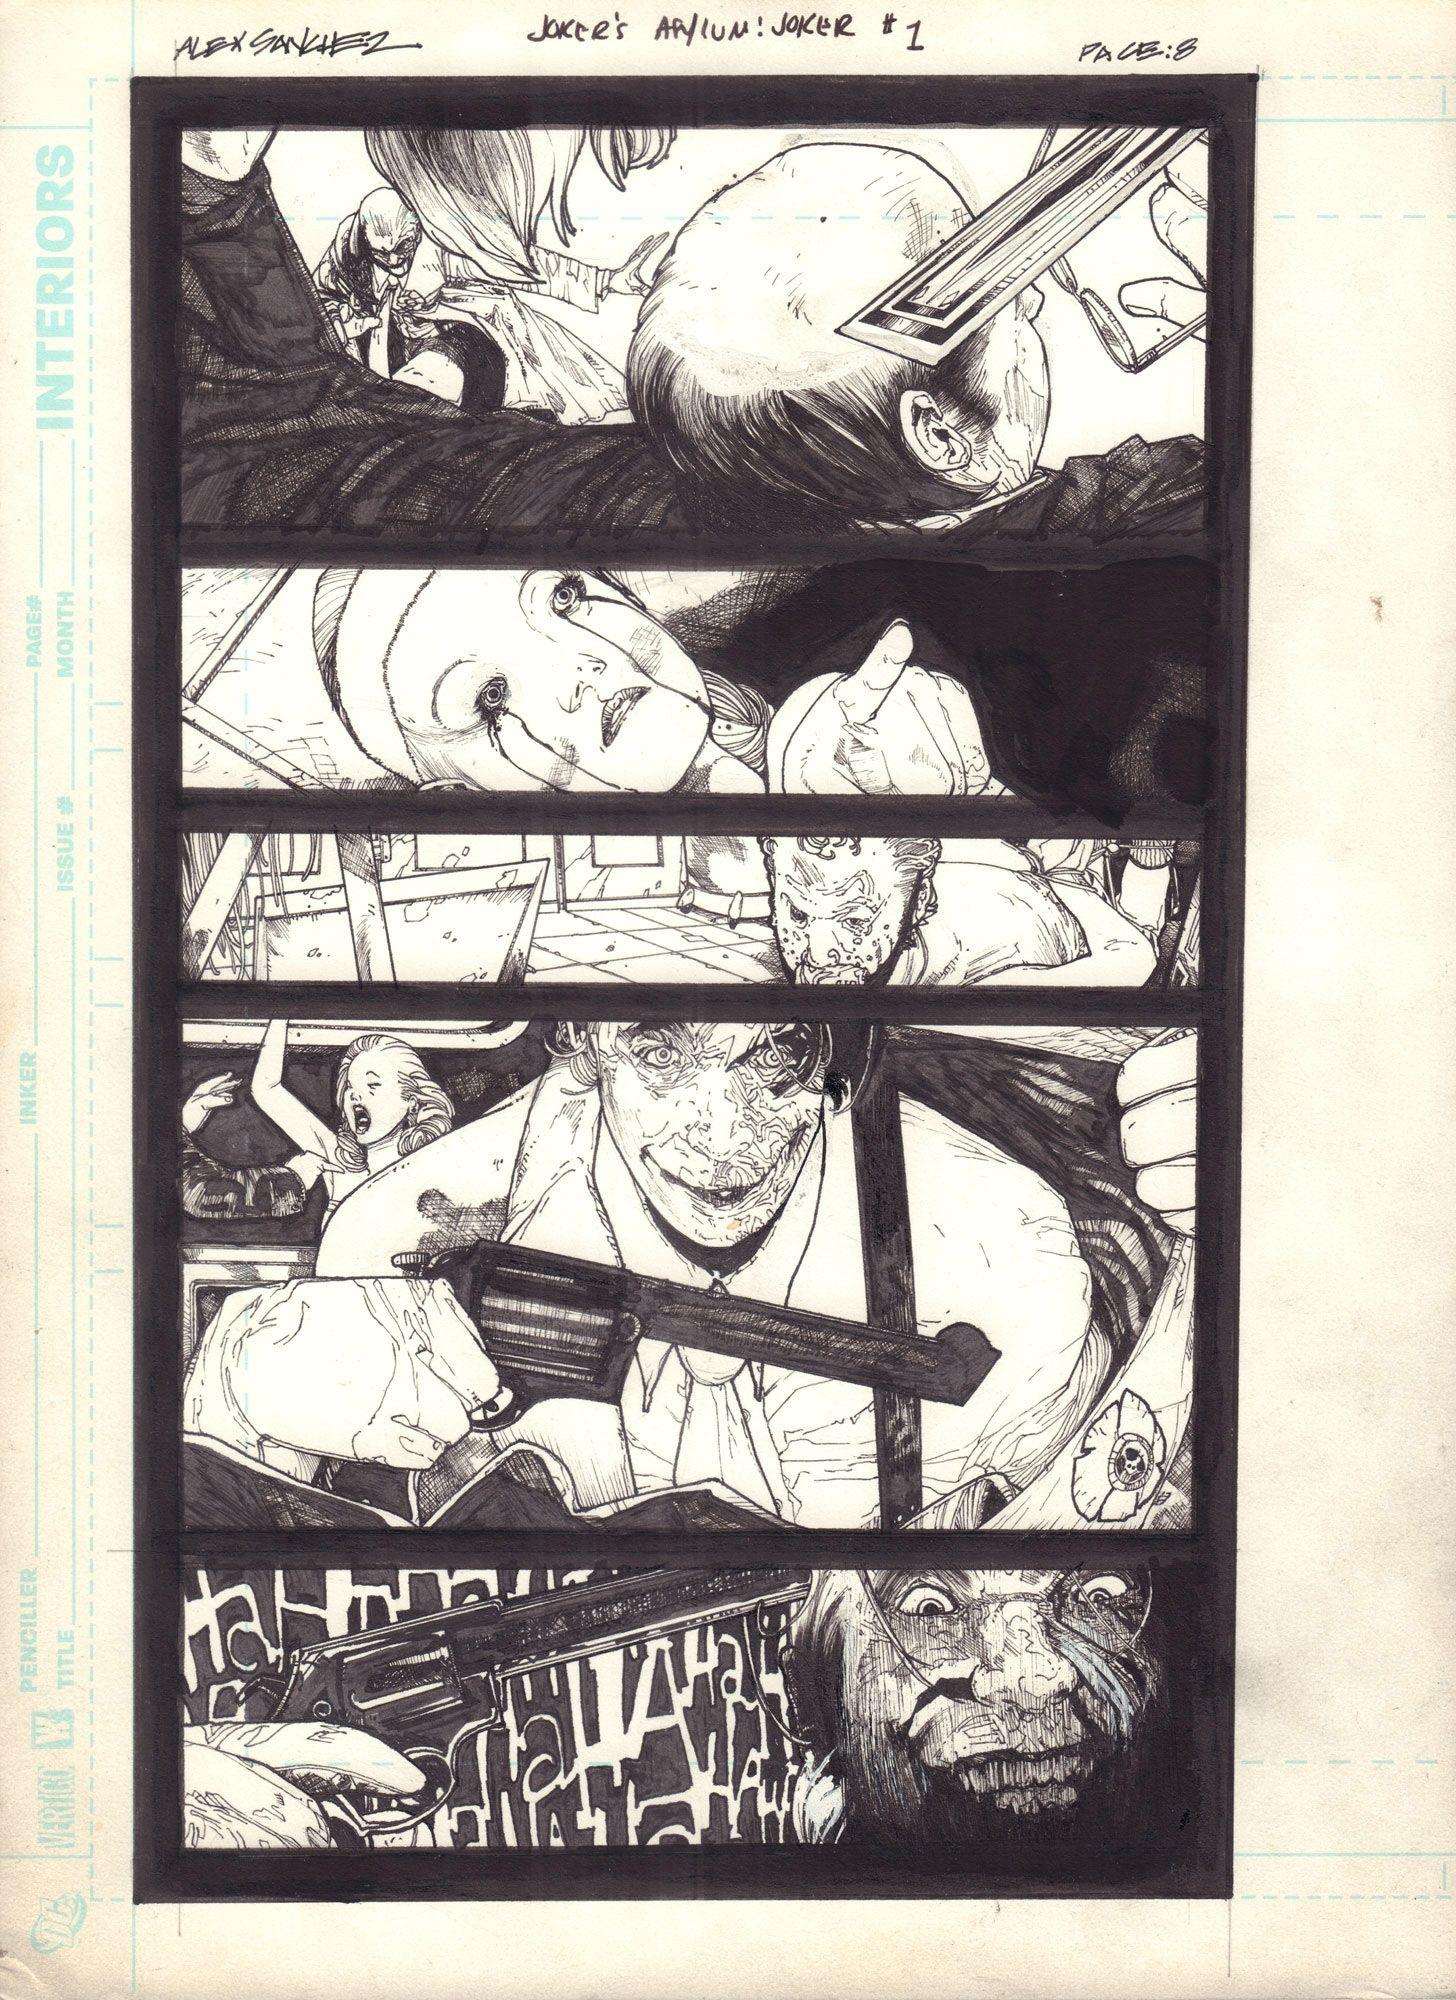 Joker's Asylum: The Joker, s. 8